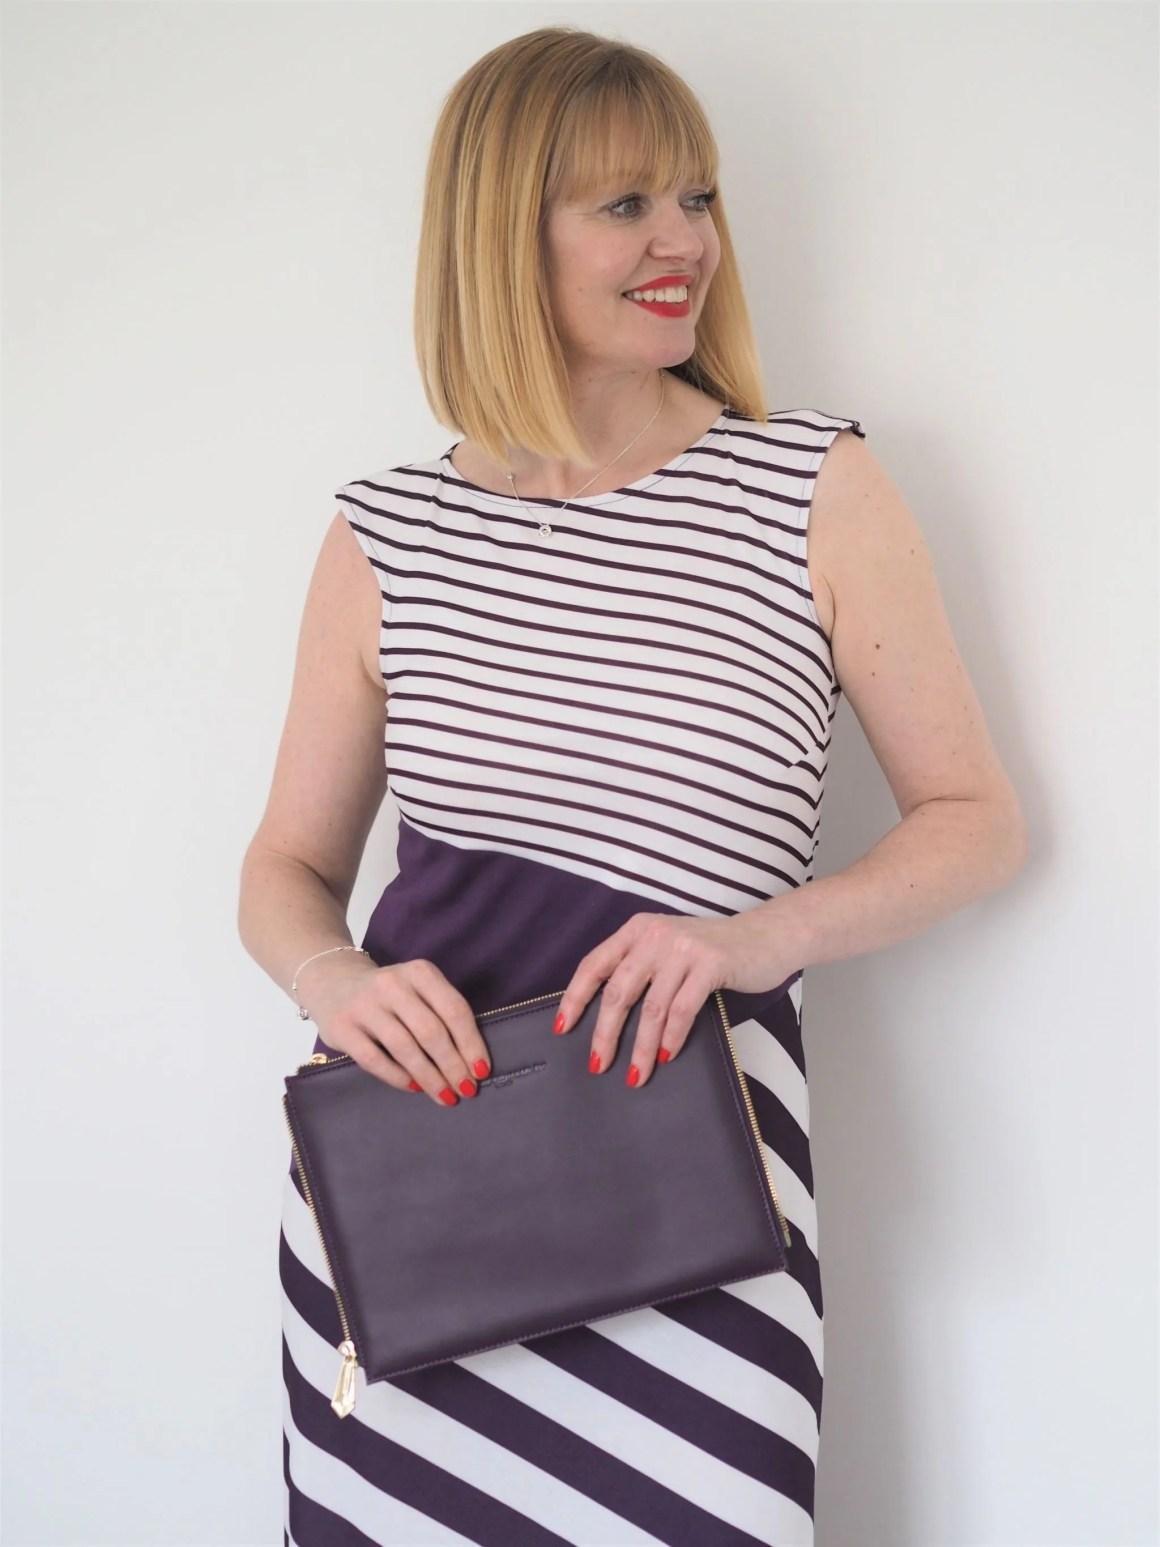 what-lizzy-loves-jennifer hamley-model-kt-laptop-work-bag-zip-off-clutch